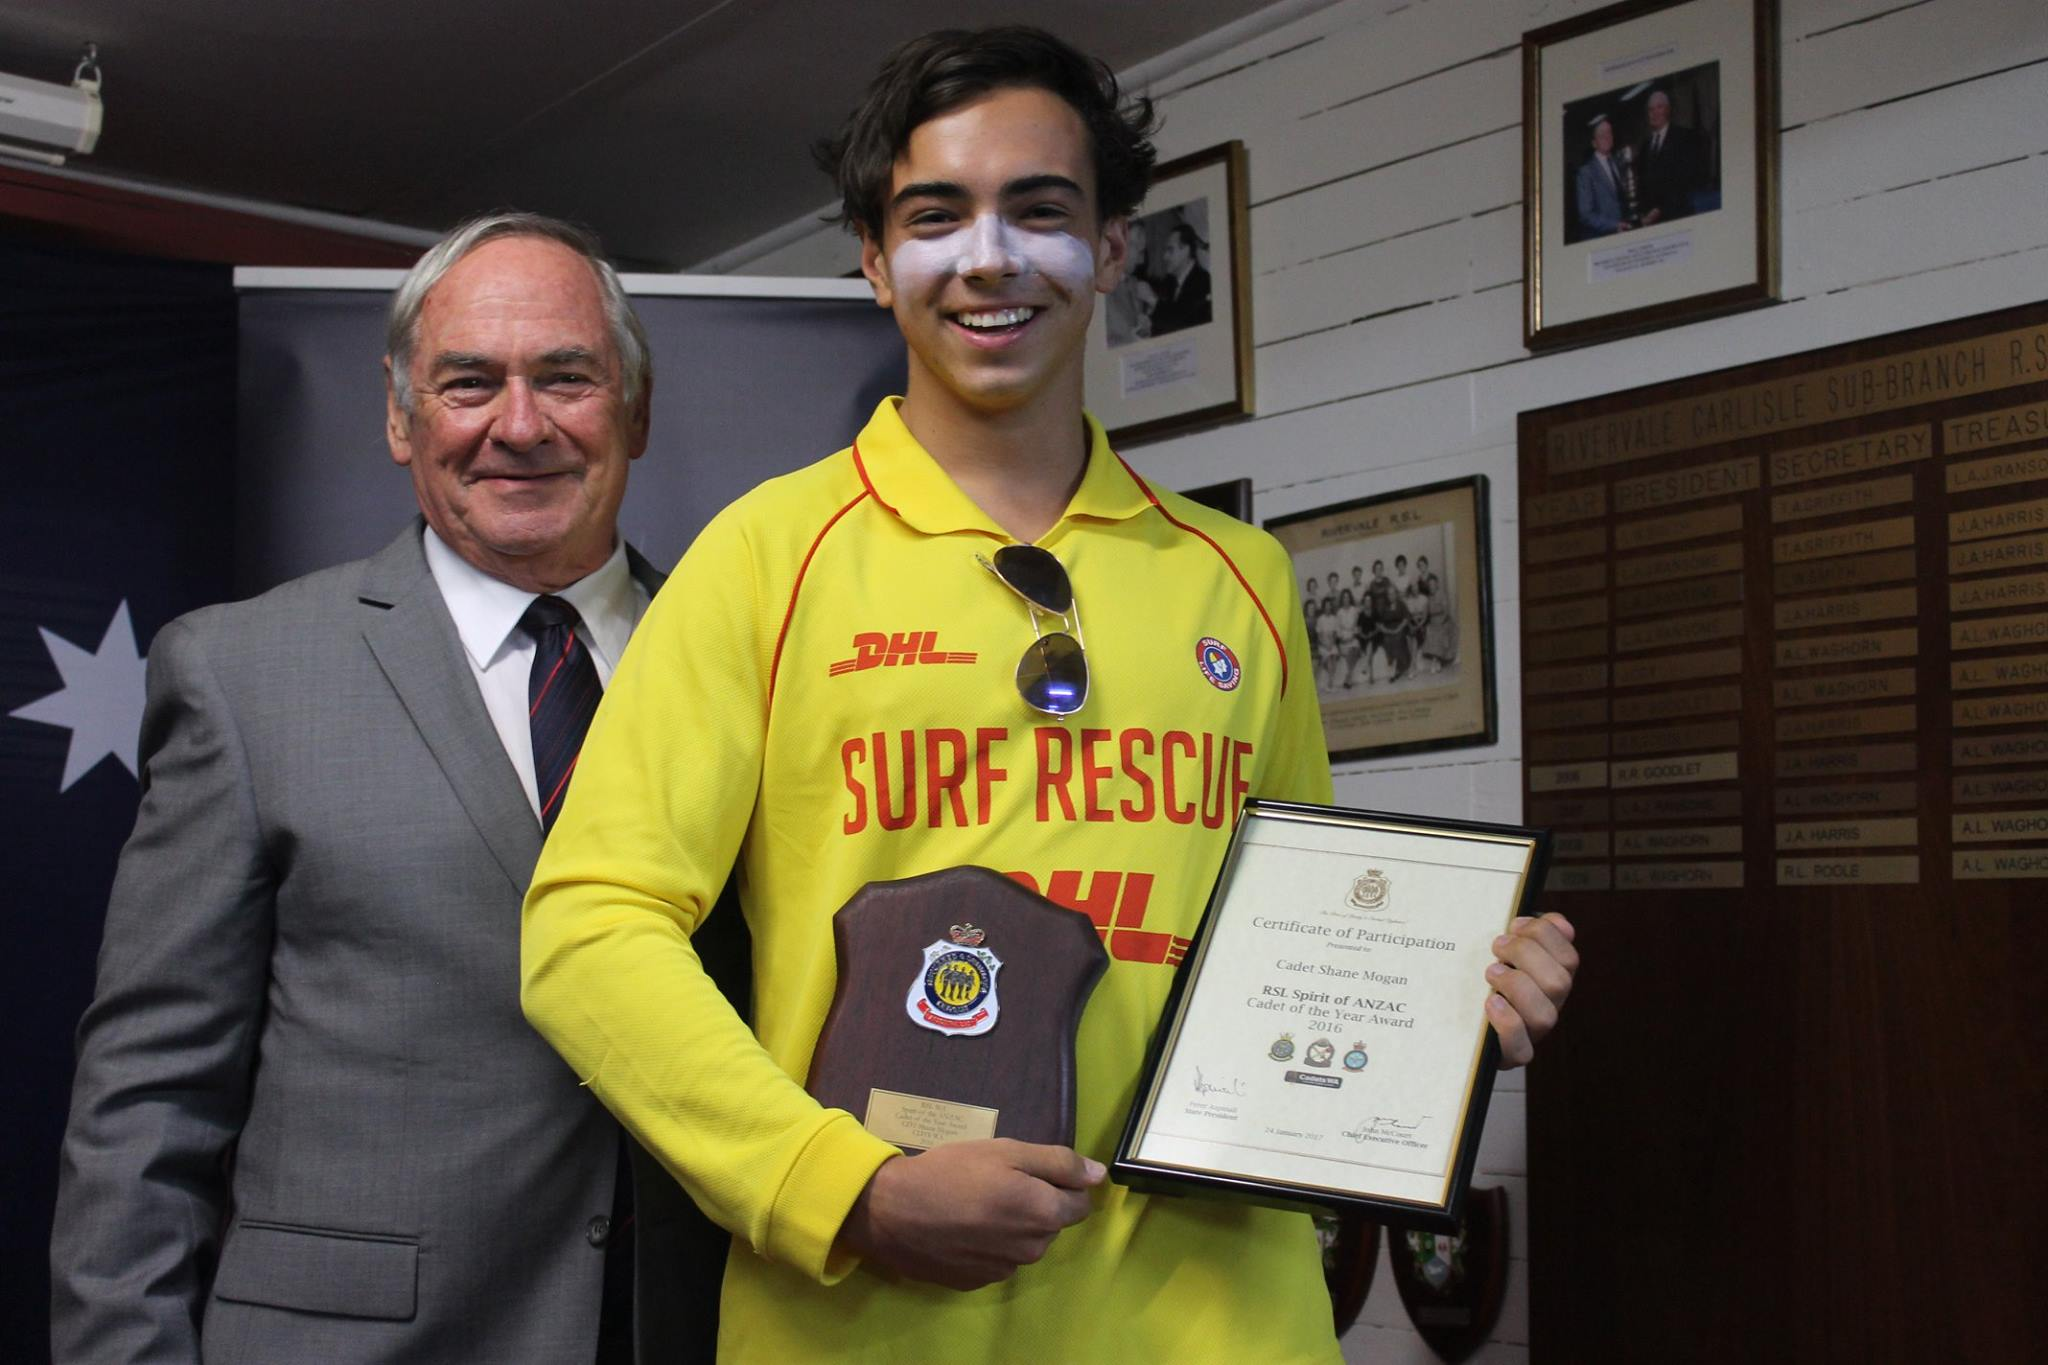 RSLWA Surf Life Saving Cadet of the Year: Shane Mogan